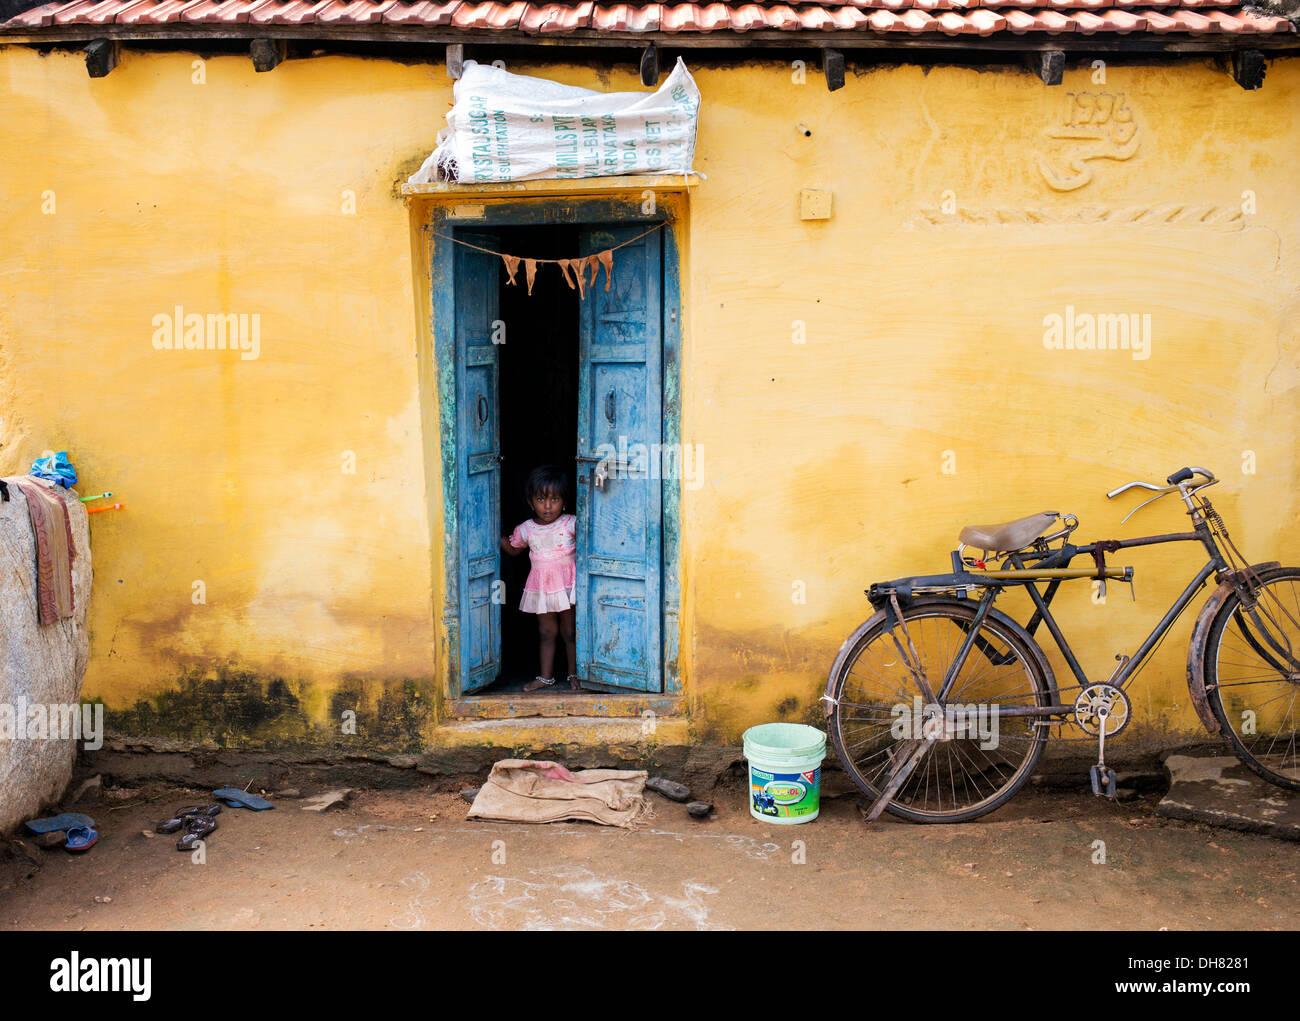 Small indian girl standing in her rustic village house doorway andhra pradesh india